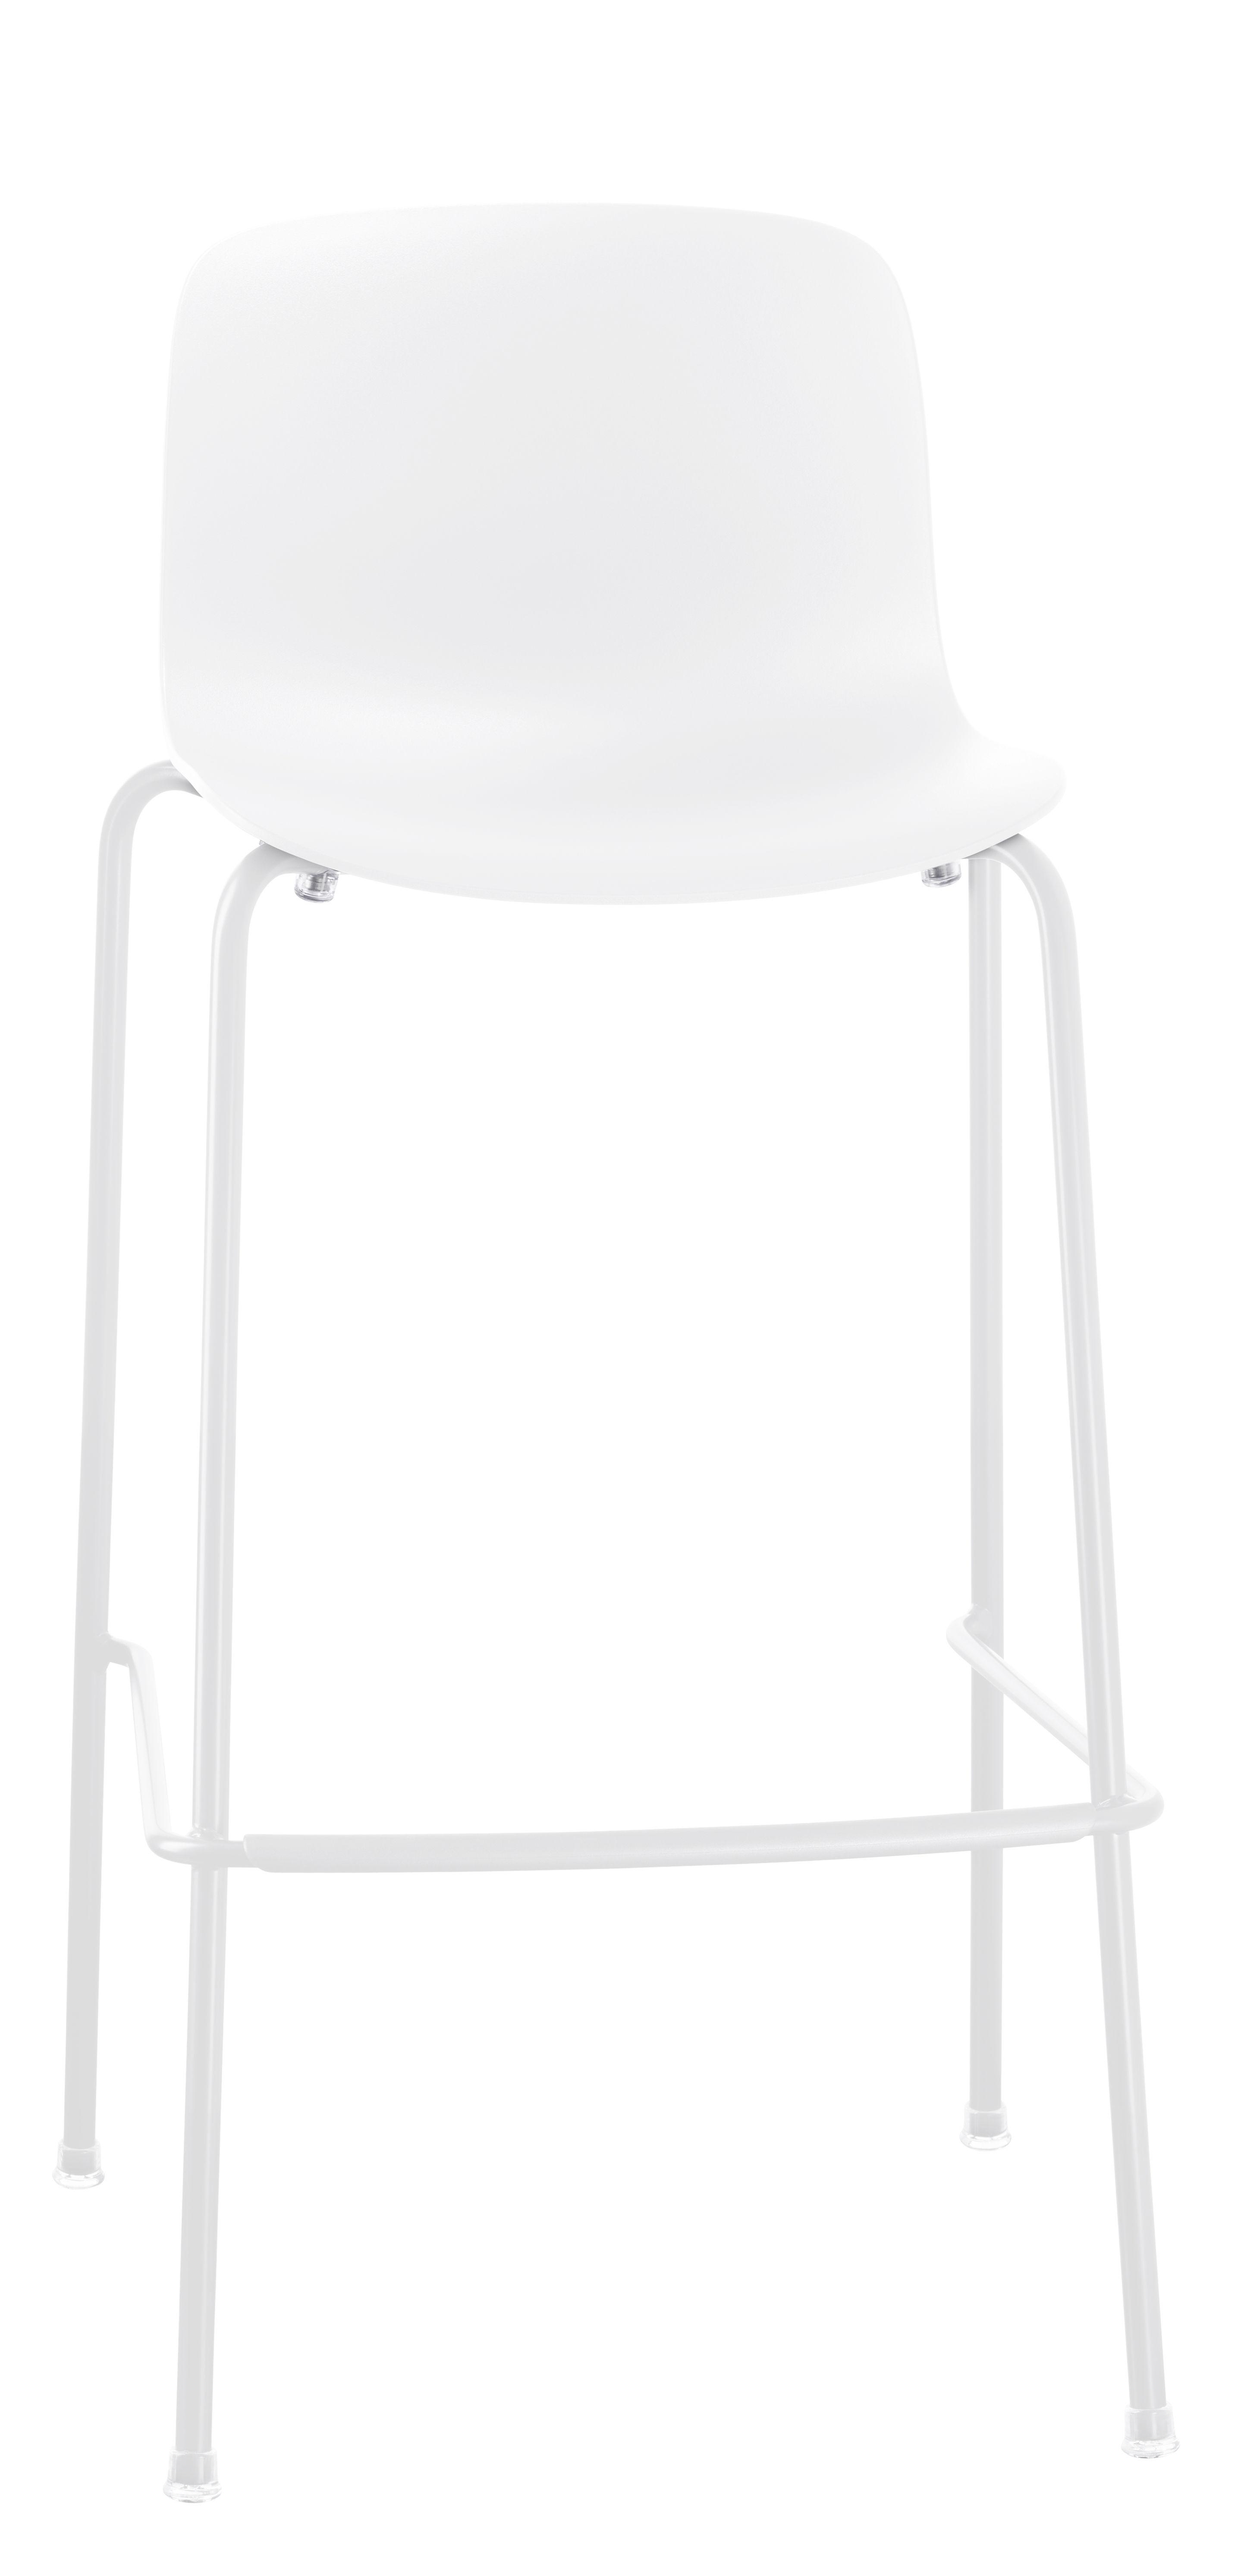 Furniture - Bar Stools - Troy Outdoor Bar stool - Plastic & 4 metal feet - H 65 cm by Magis - White - Polypropylene, Steel